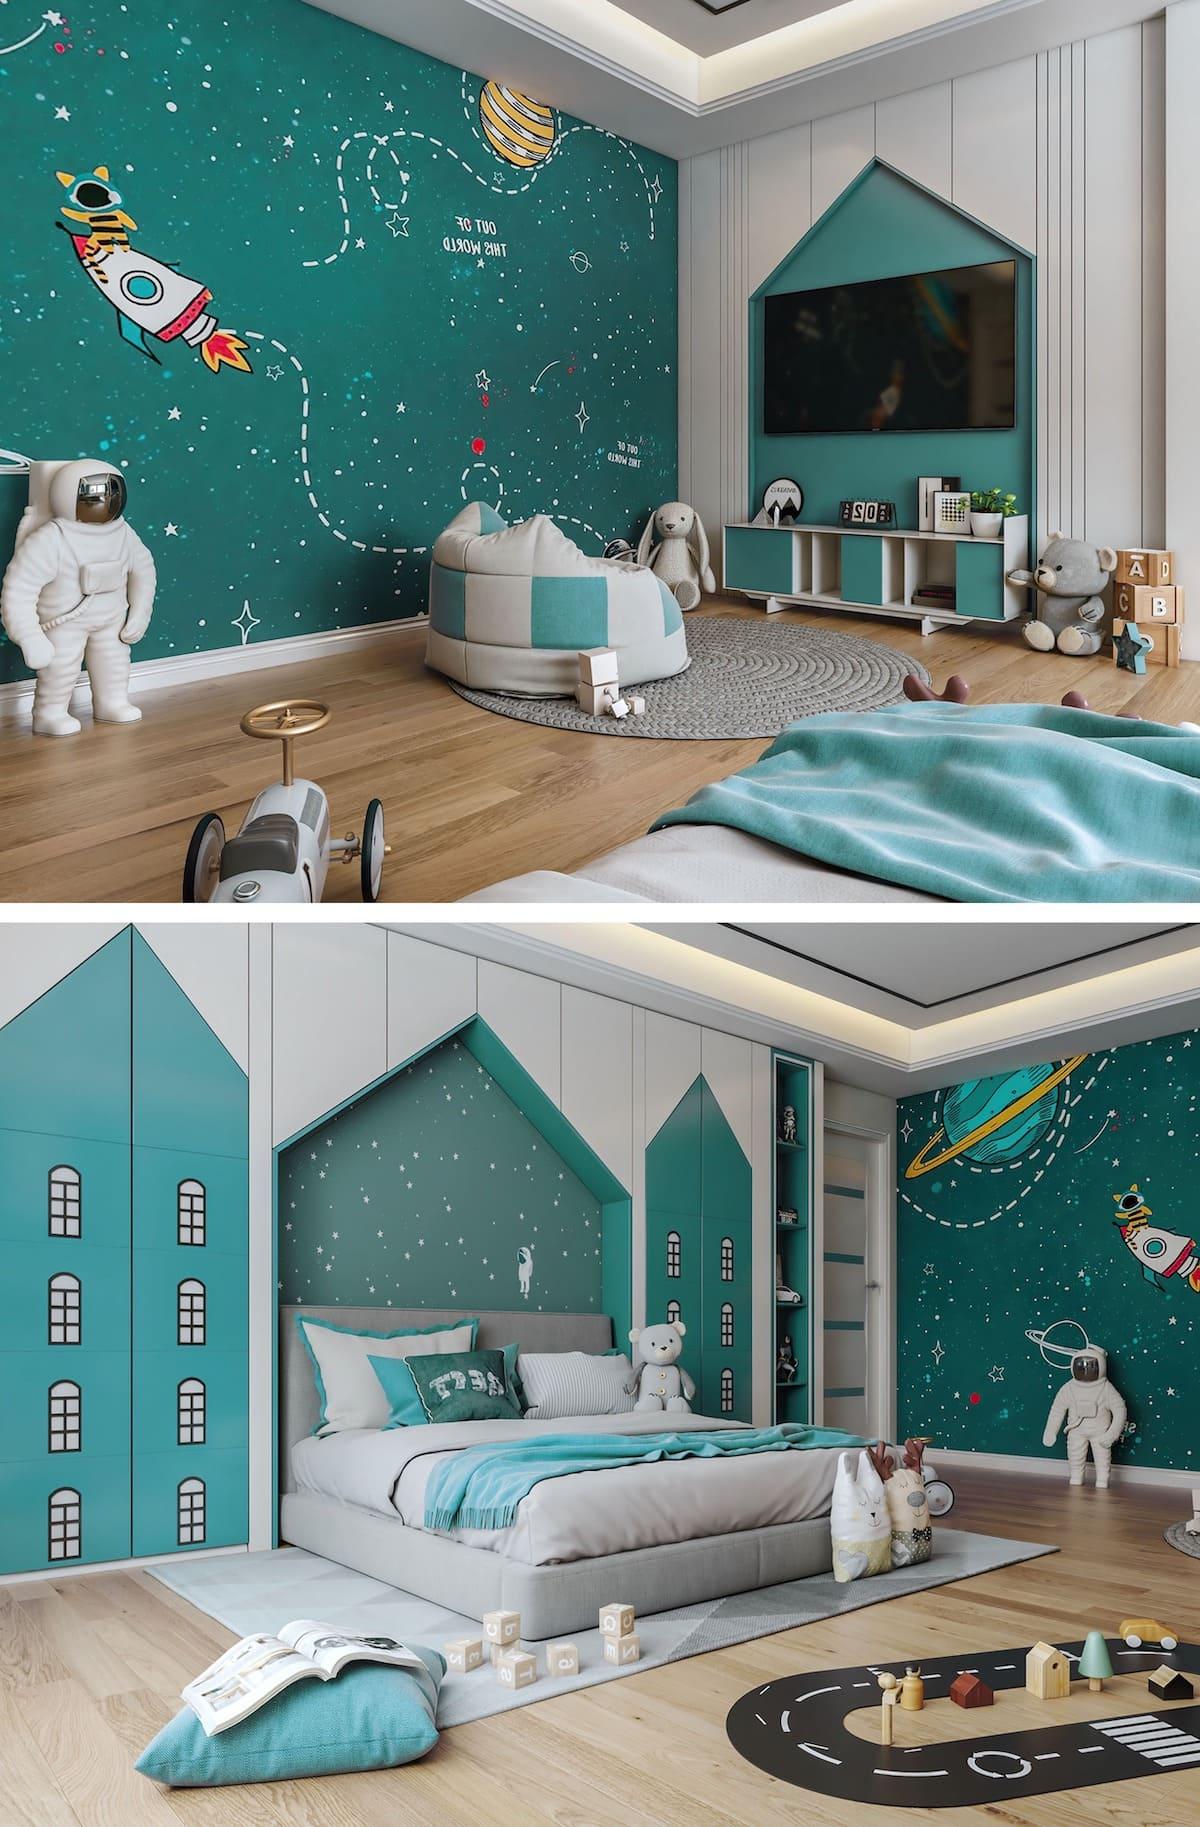 интерьер детской комнаты фото 41